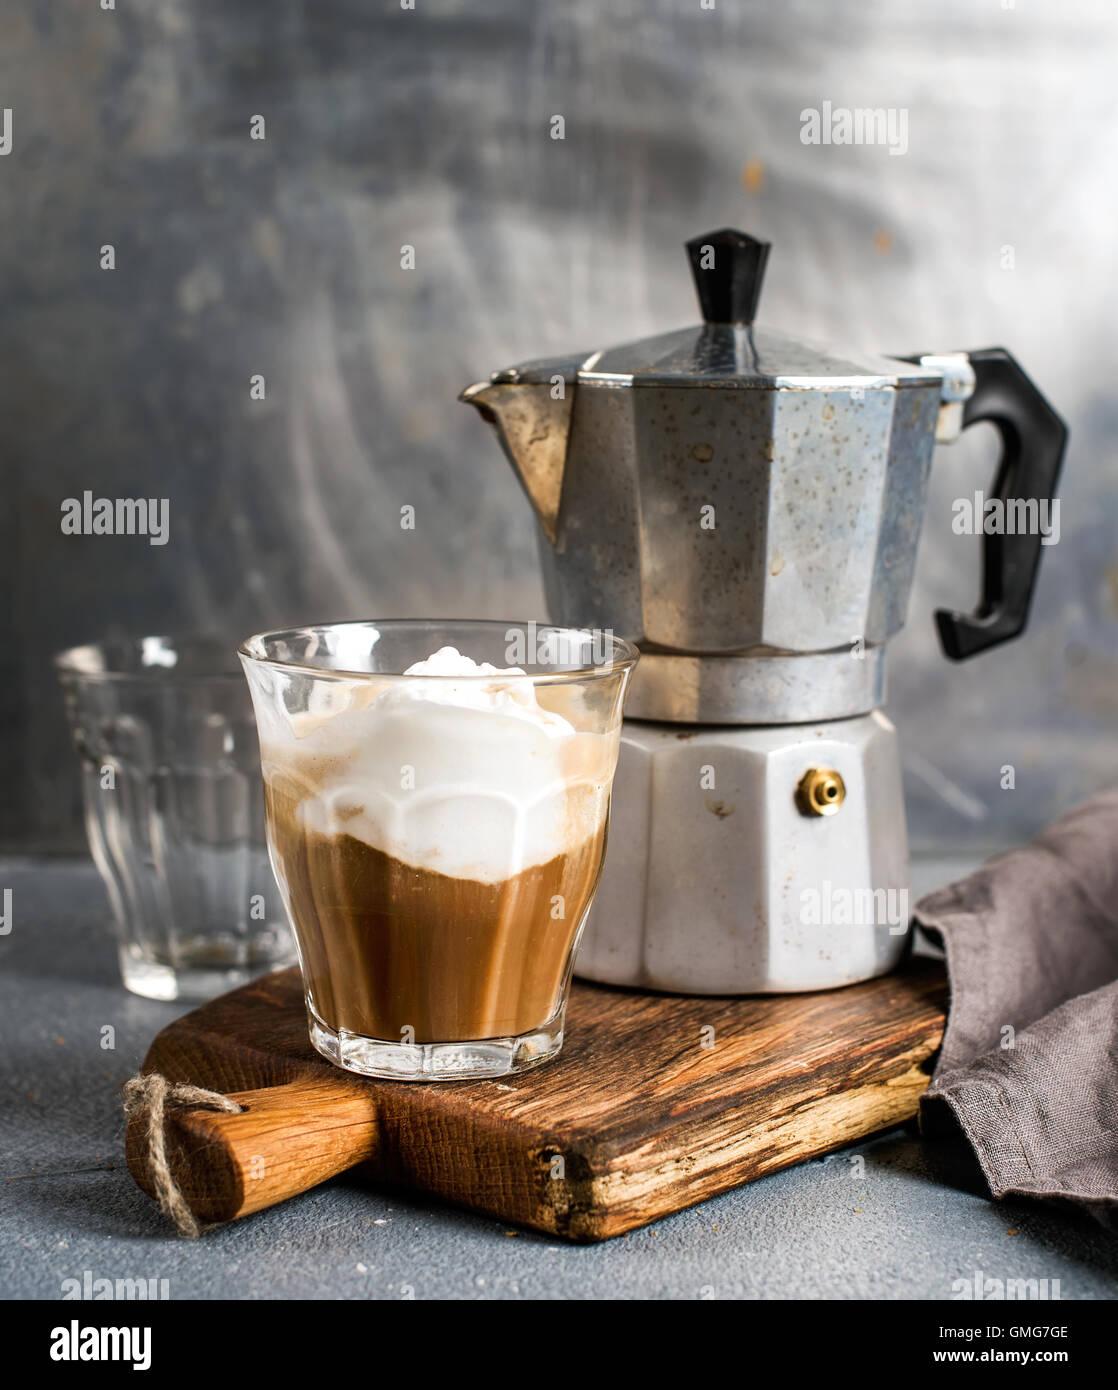 Glass of coffee with ice cream on rustic wooden board and steel Italian Moka pot - Stock Image